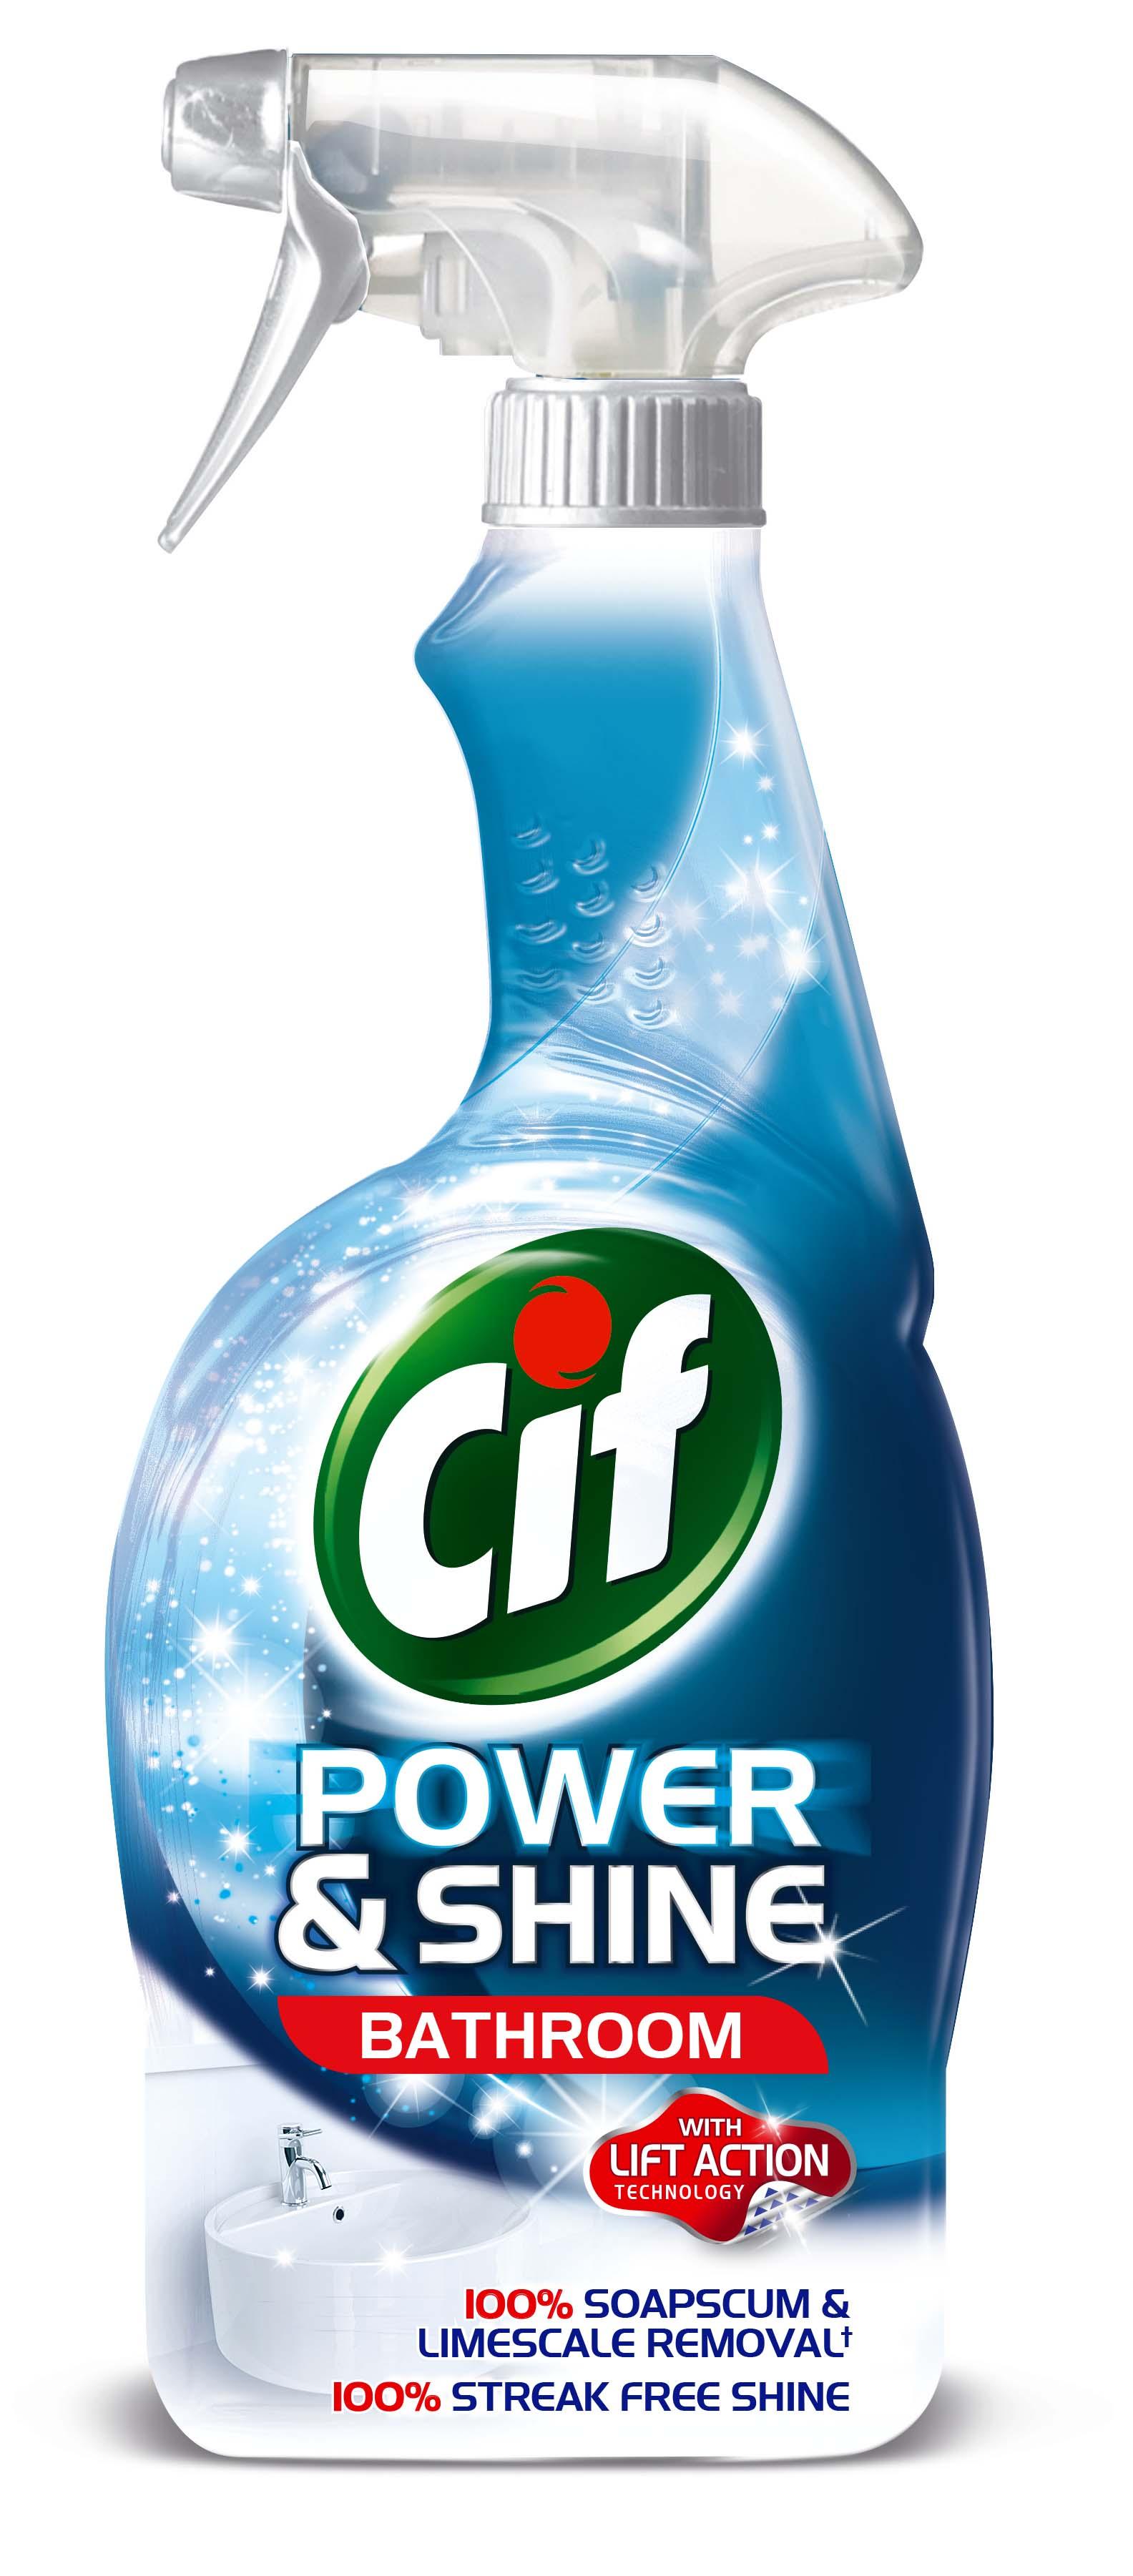 Cif power amp shine bathroom - Cif Power Amp Shine Bathroom 4